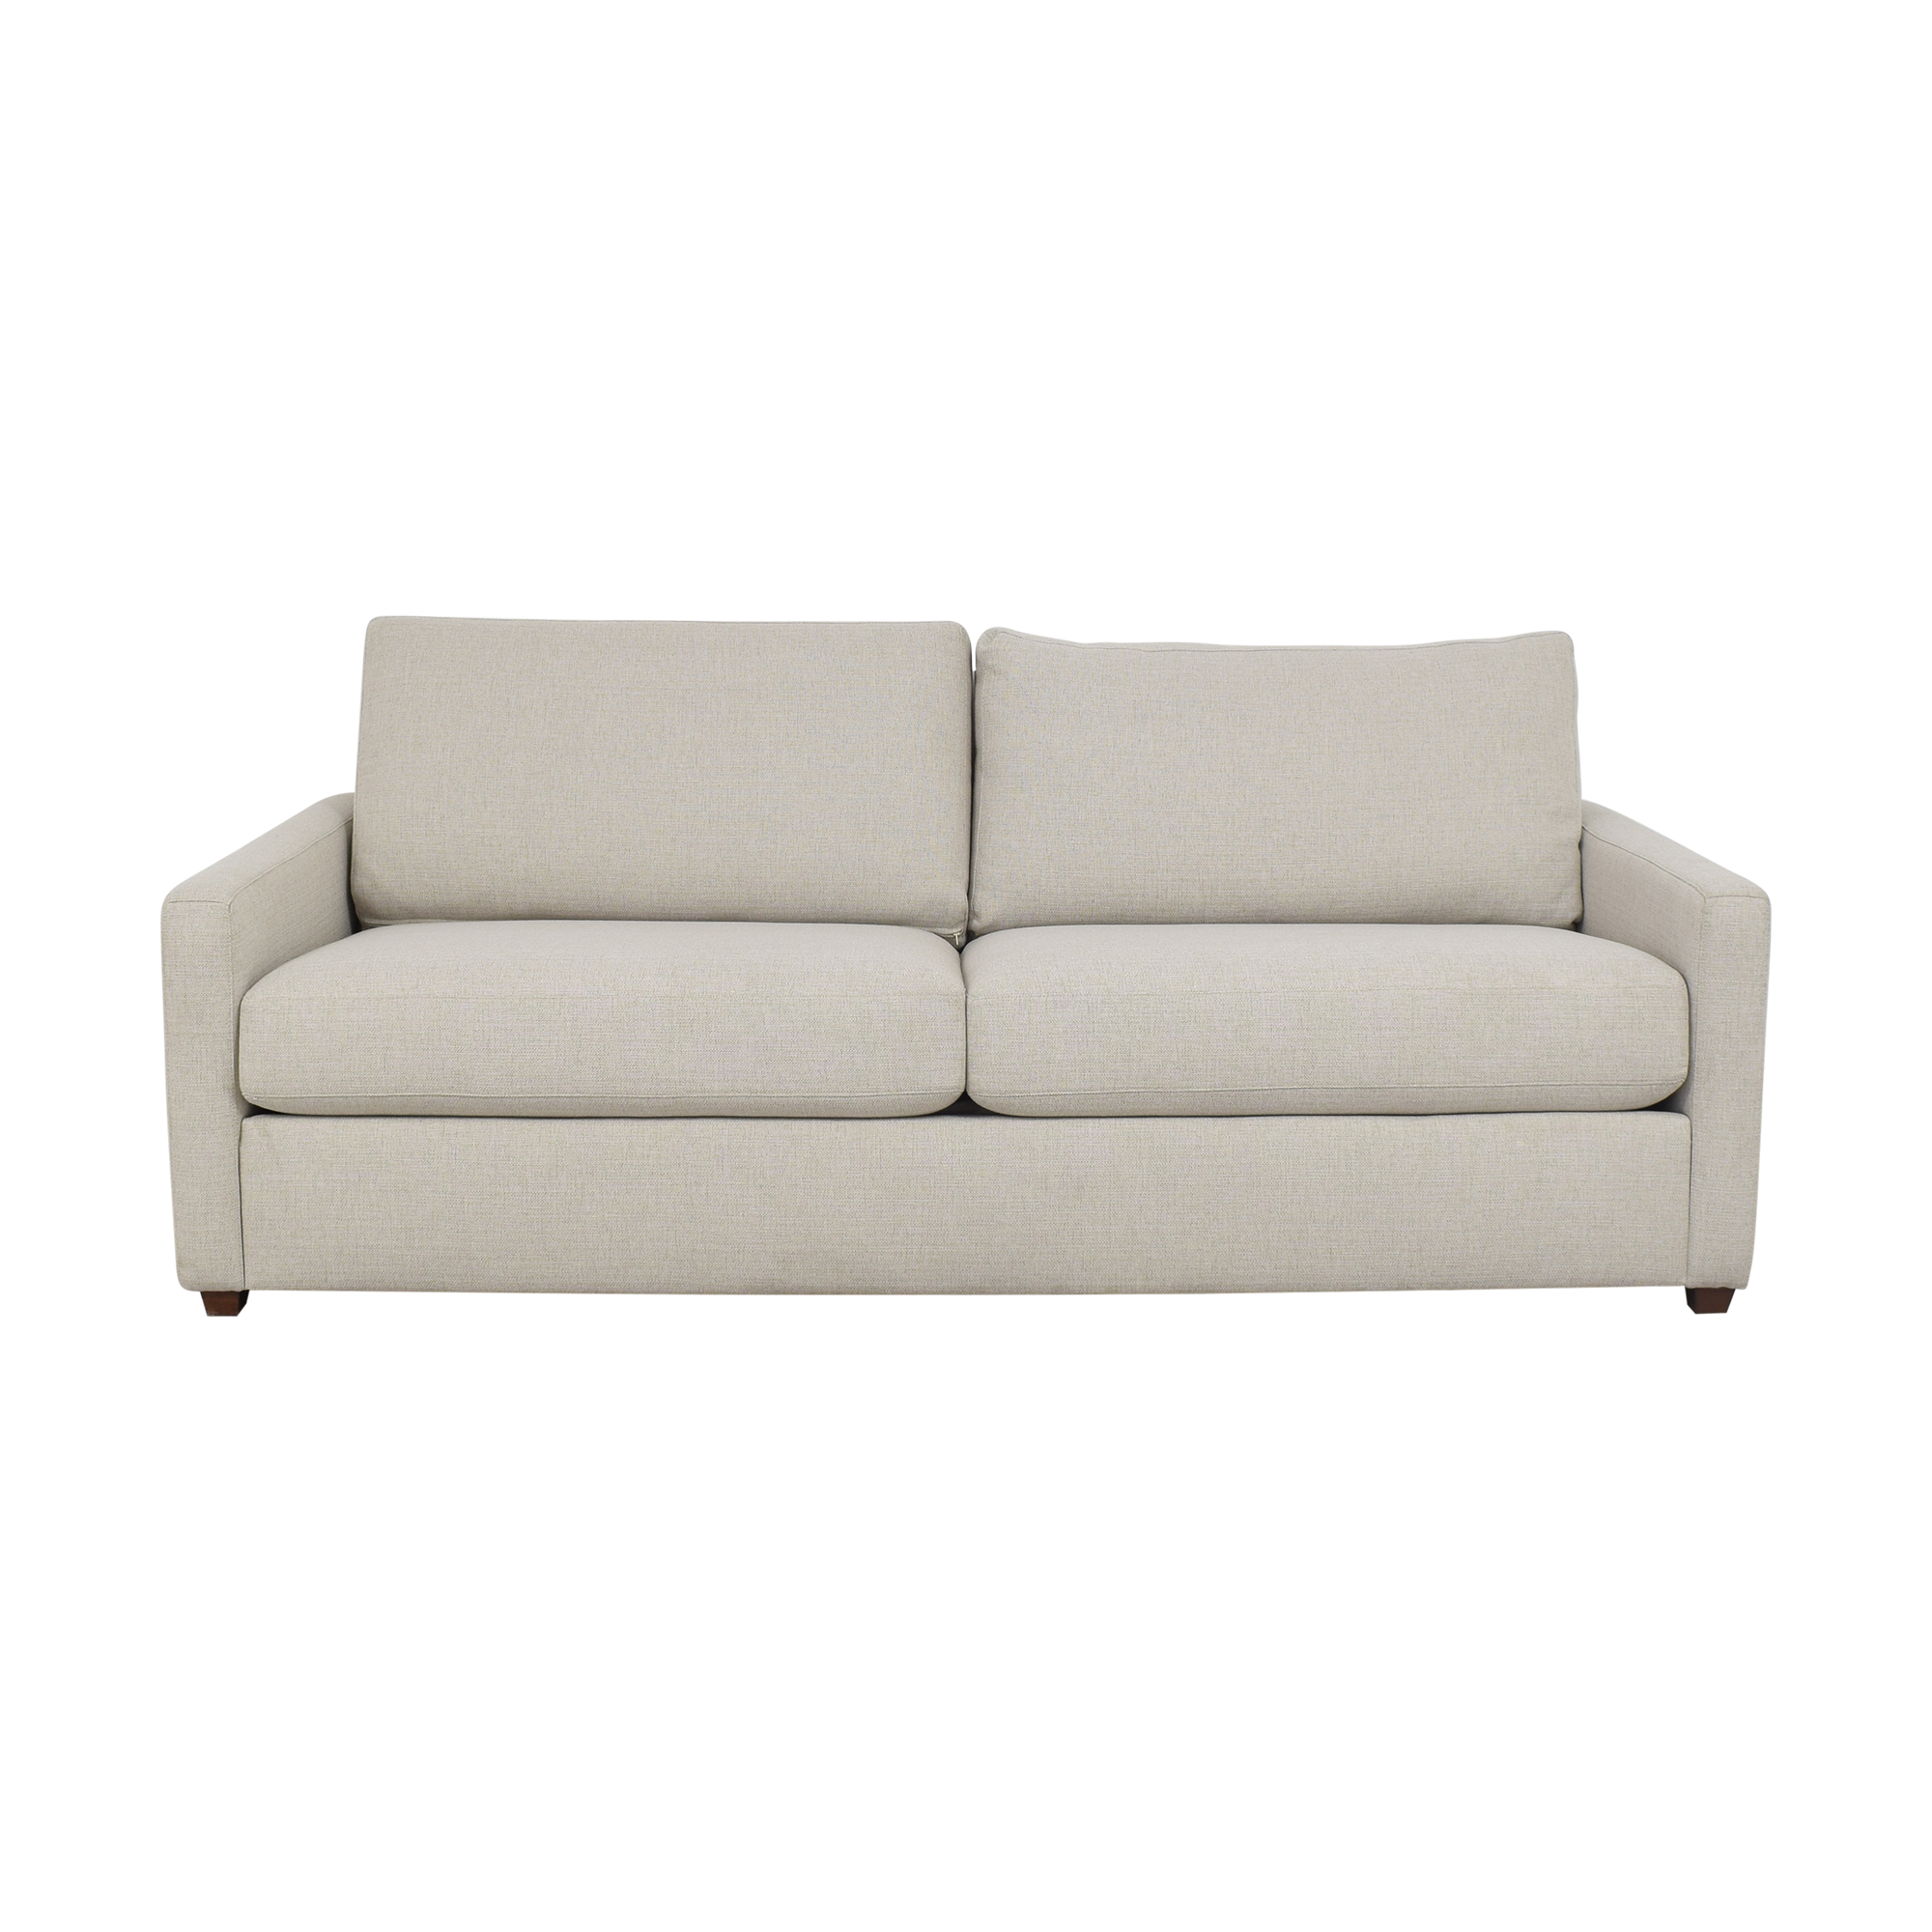 BenchMade Modern BenchMade Modern Couch Potato Lite Sofa pa